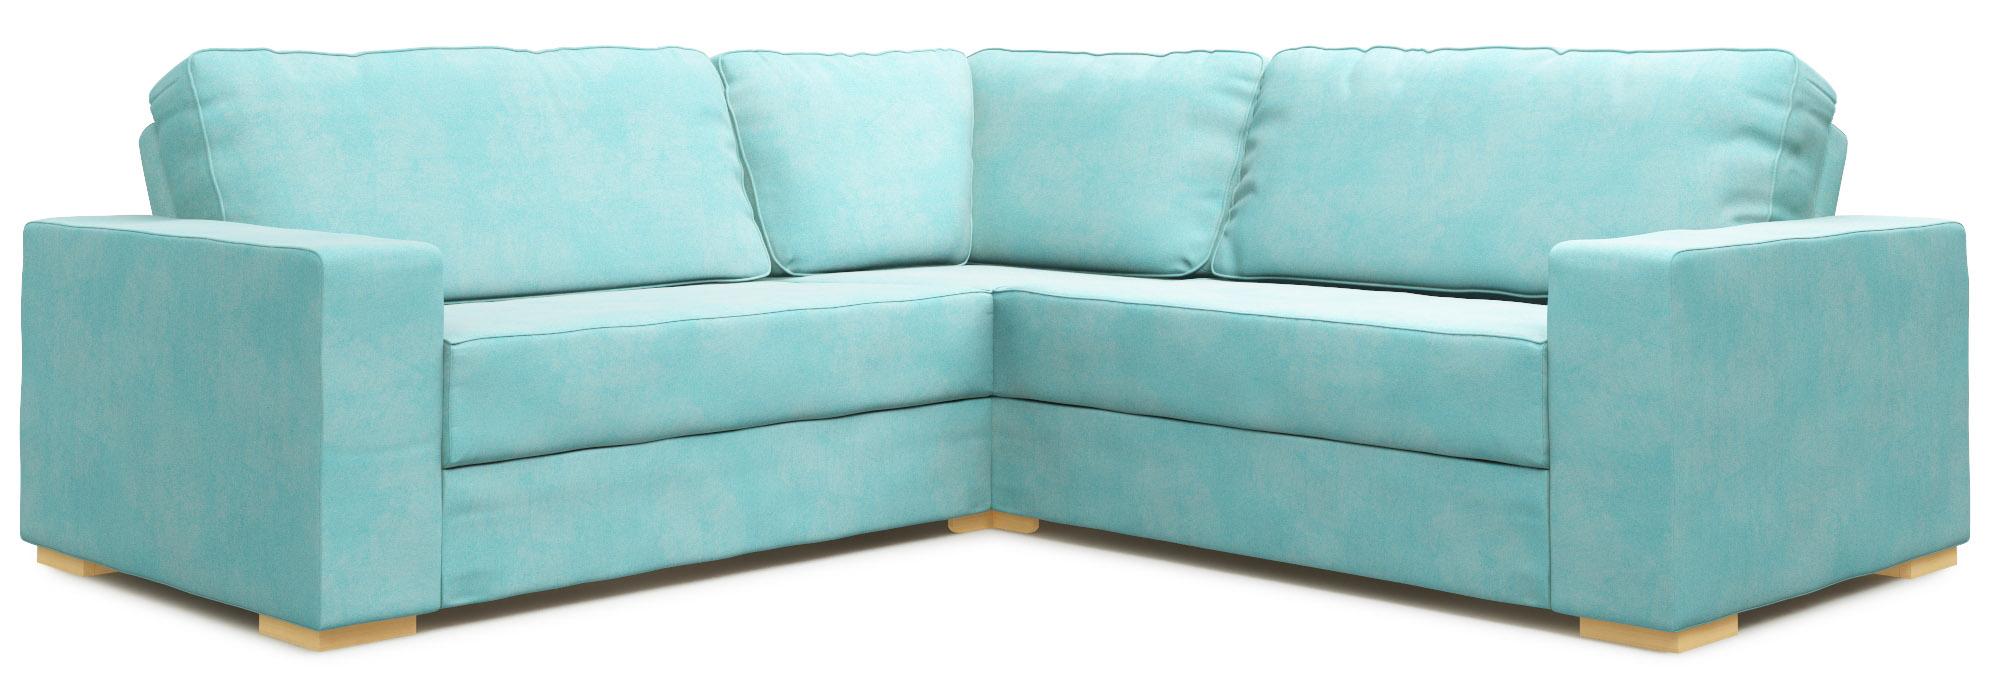 Xia 2X2 Corner Single Sofa Bed